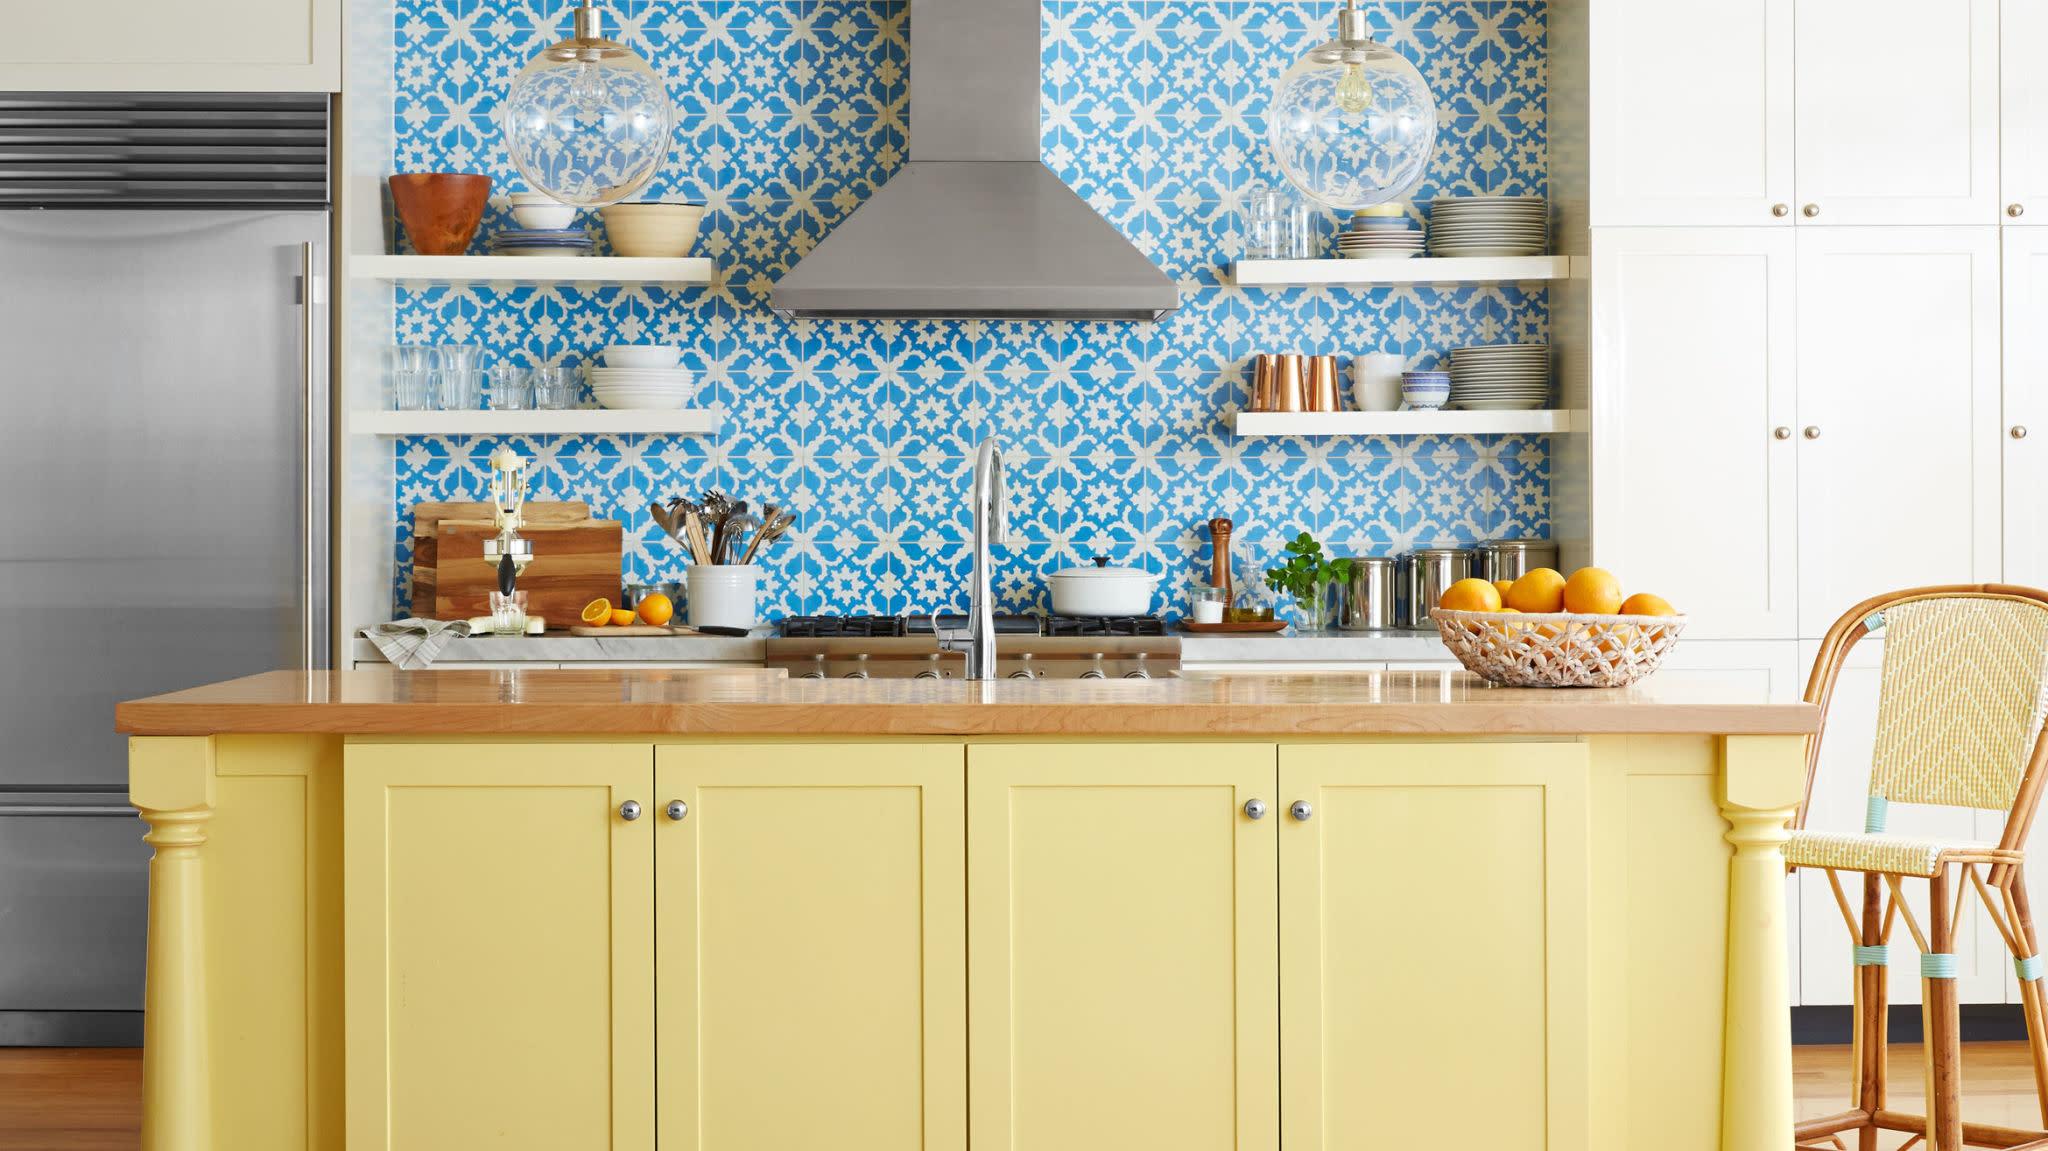 - 18 Creative Kitchen Backsplash Ideas